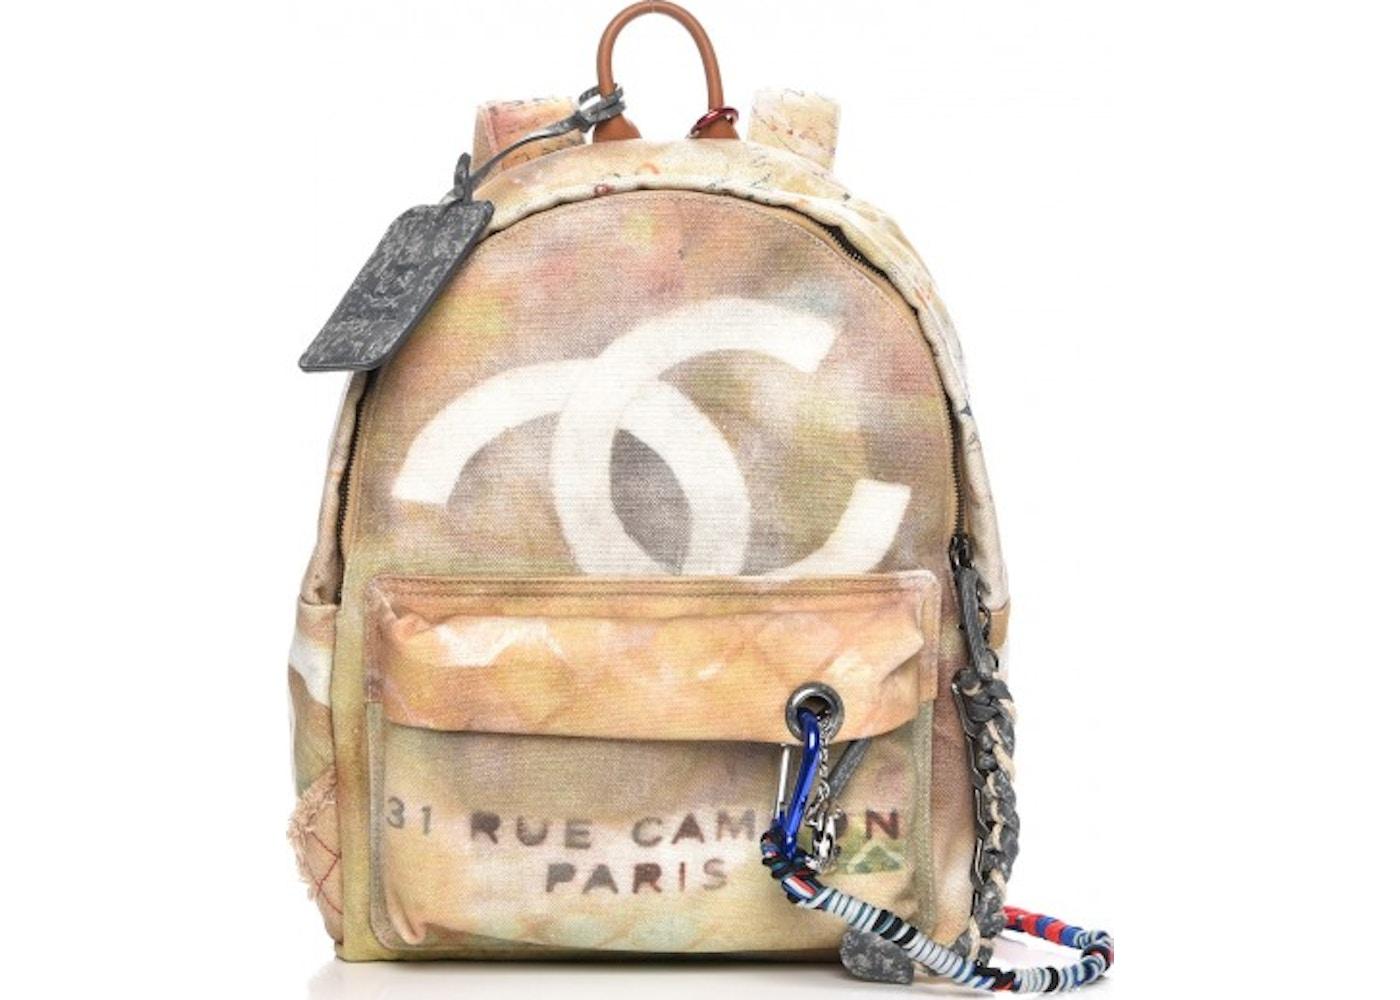 775da4527f49 Chanel Art School Backpack Graffiti Printed Medium Beige